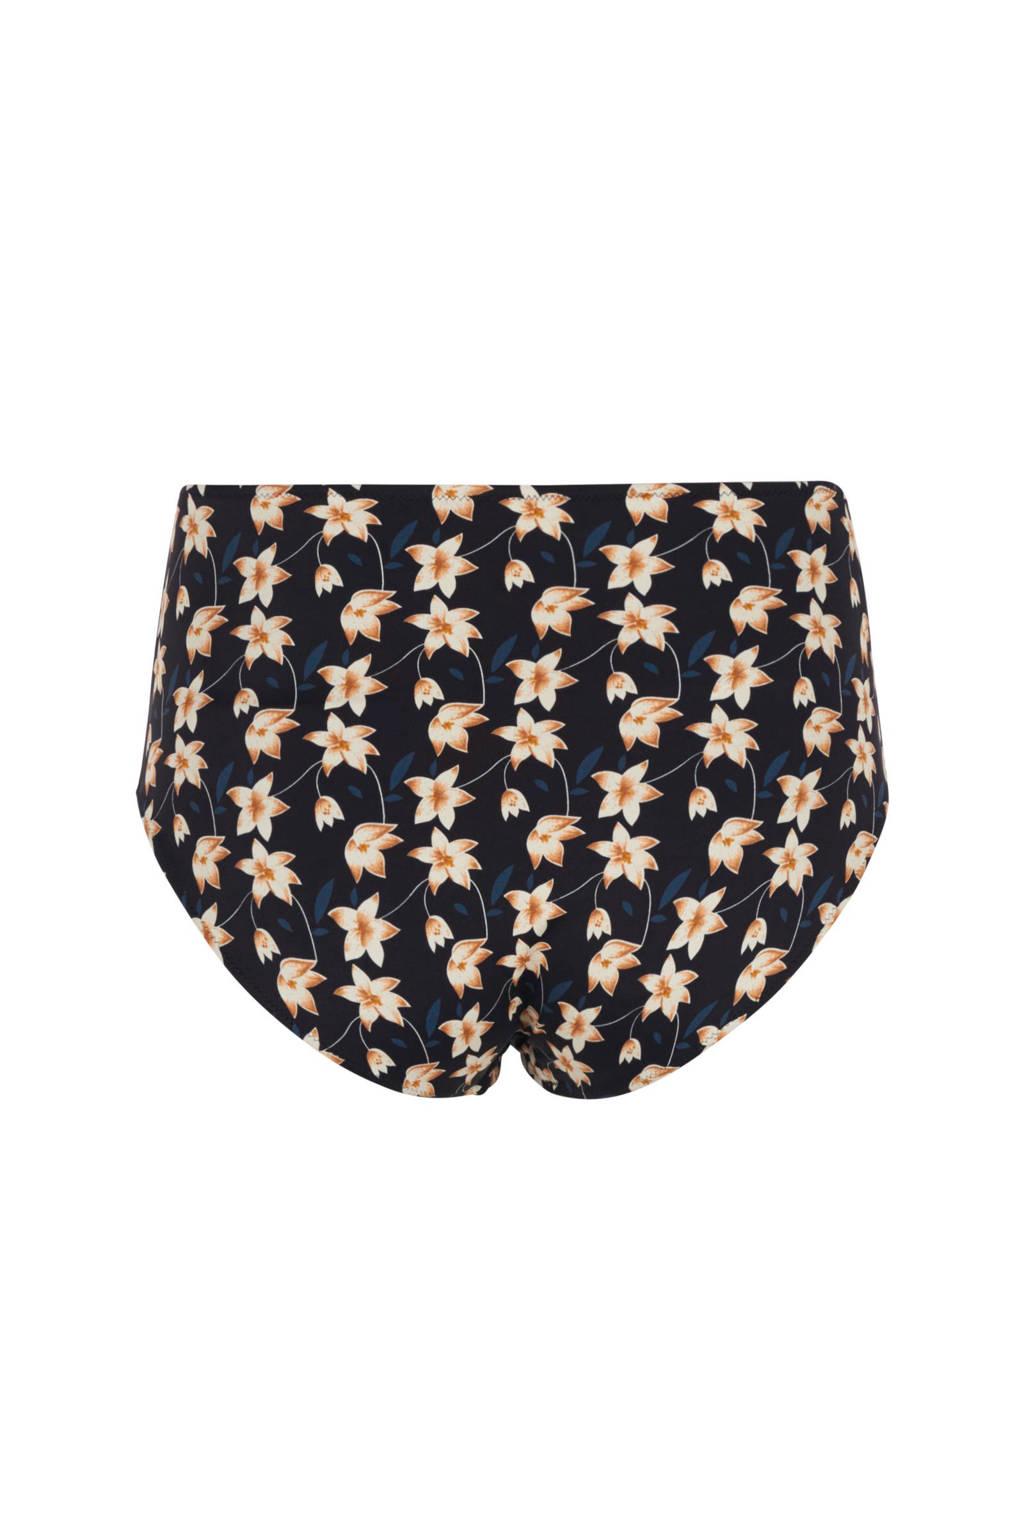 In Een Broekje Zwart Bloemenprint Bikini Zizzicorrigerend Waist High U4vx6Iqw